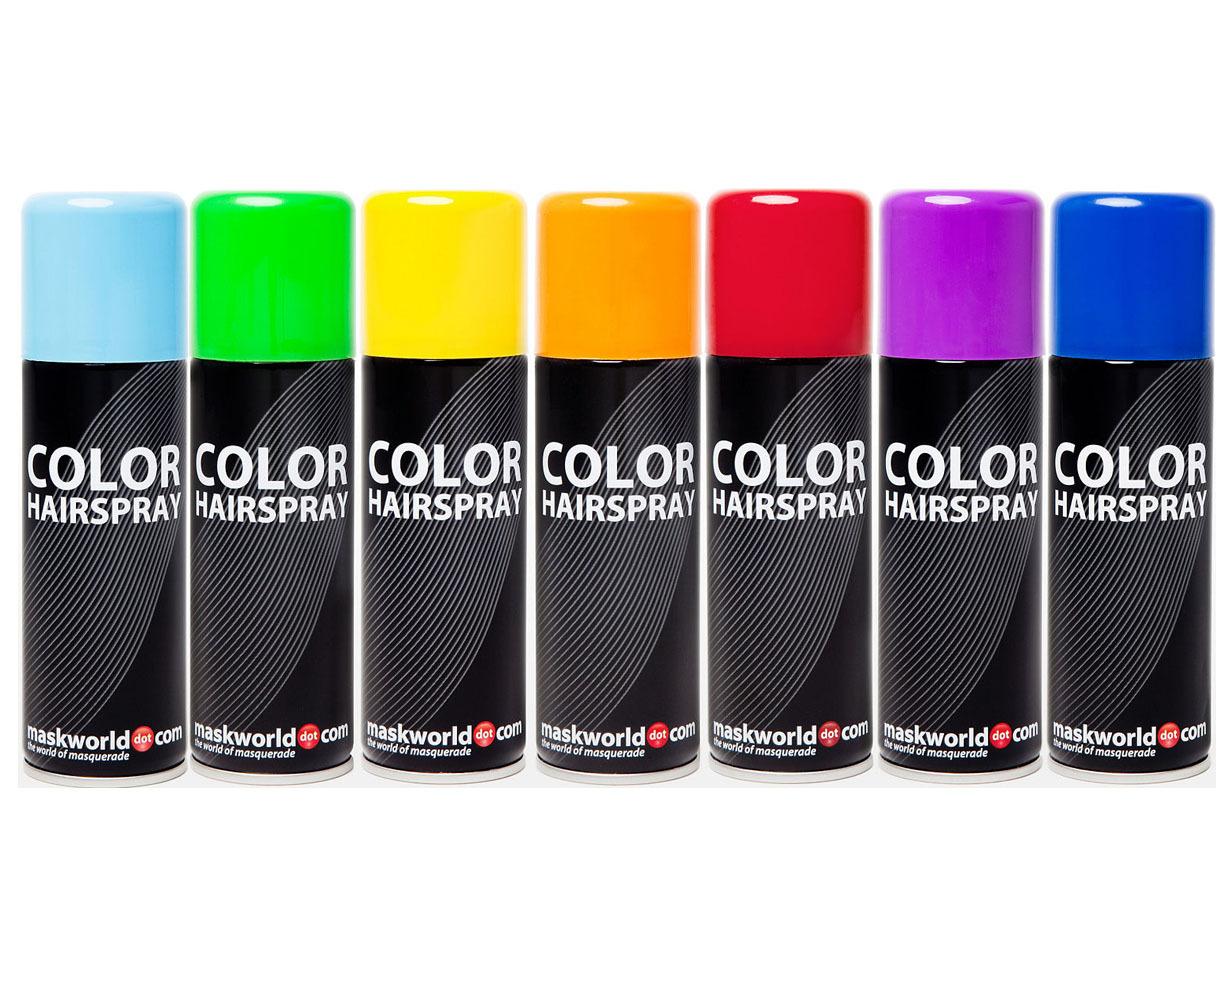 farbiges haarspray